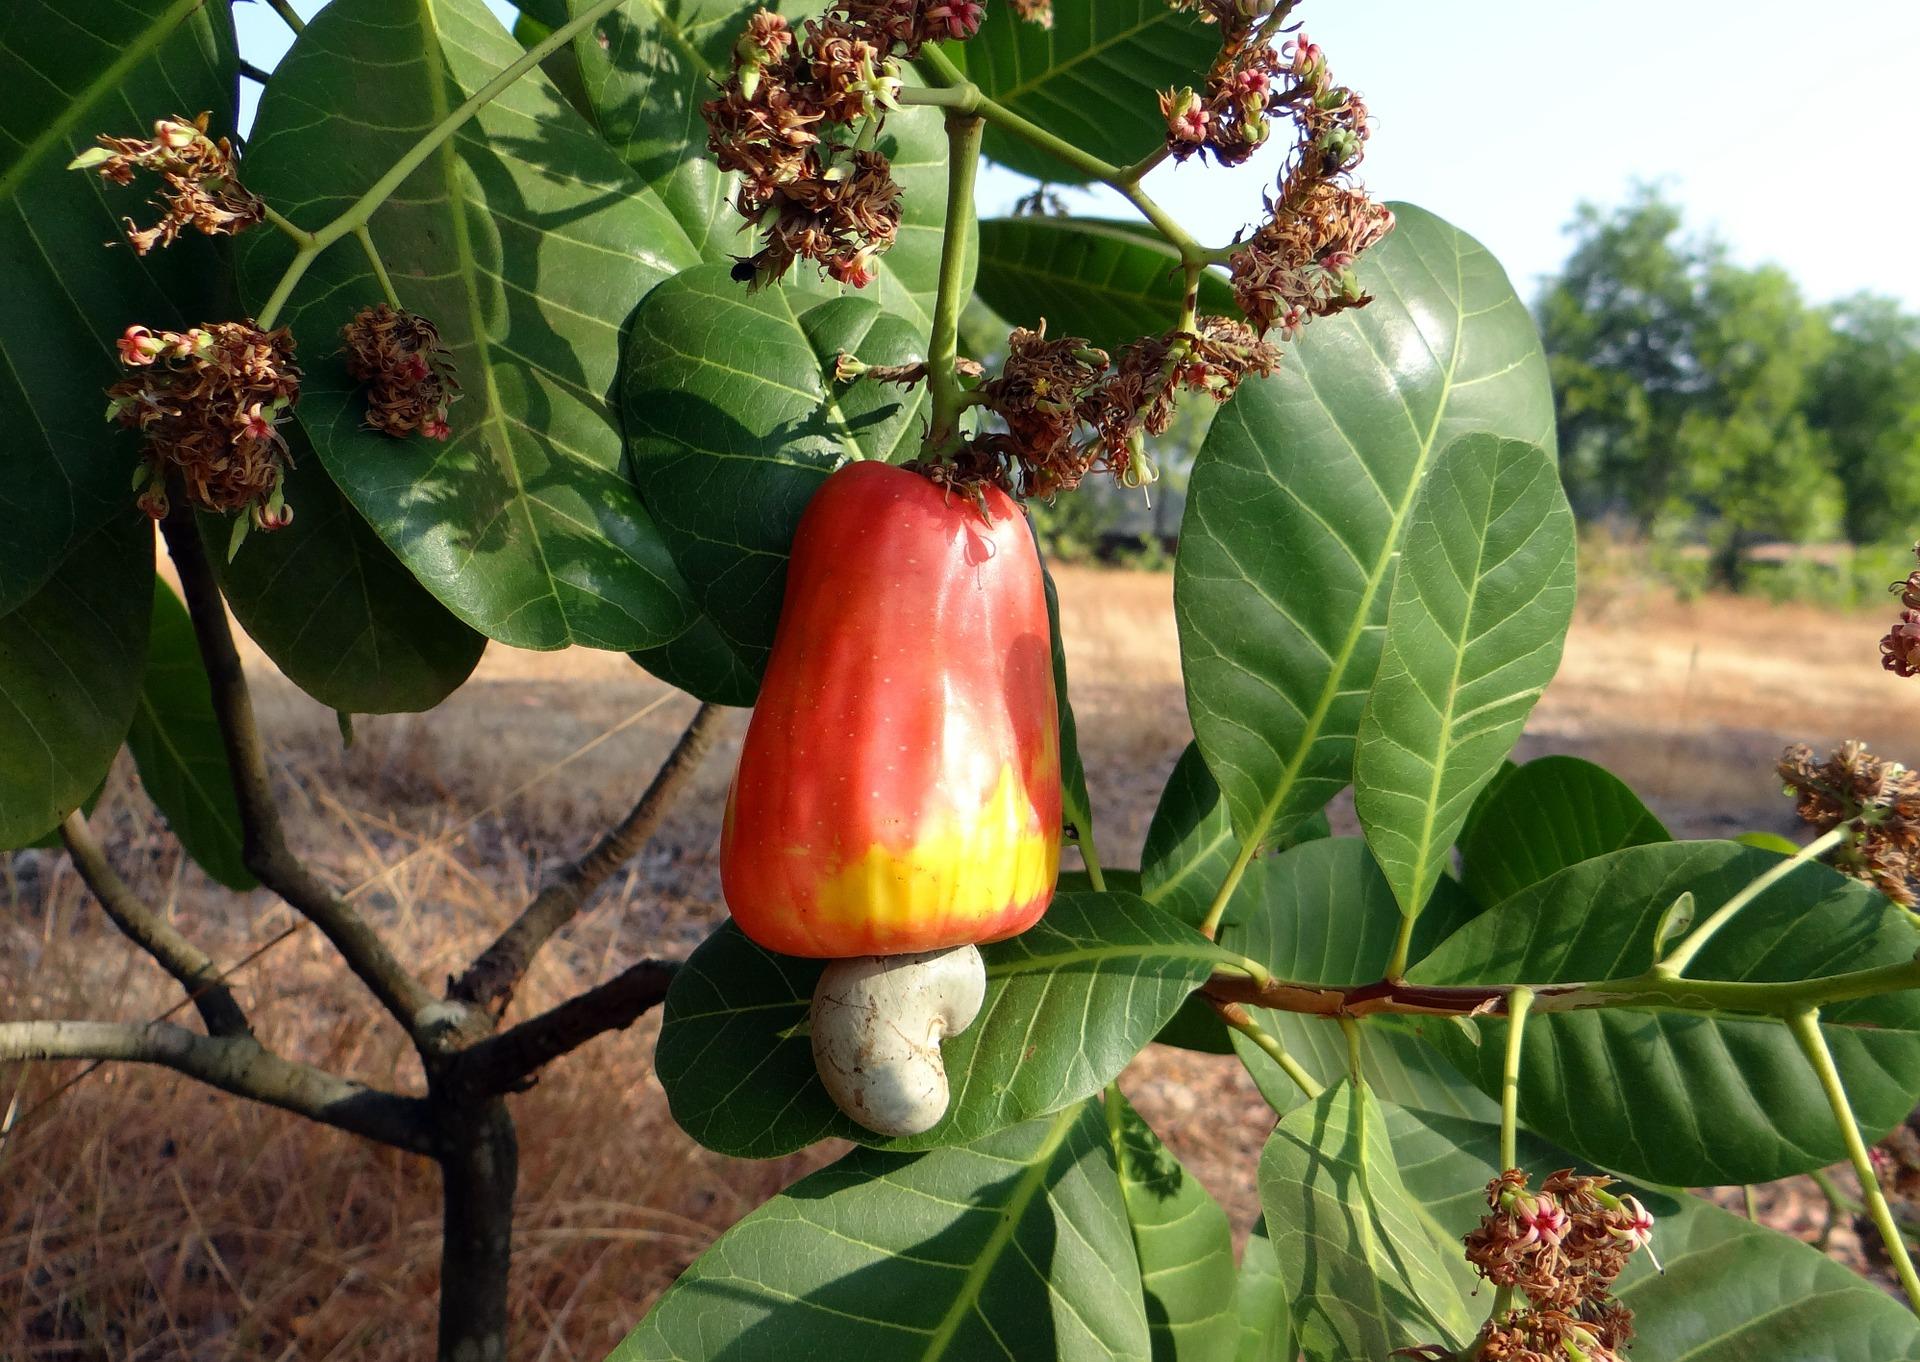 Cashew eli munuaispuun hedelmä